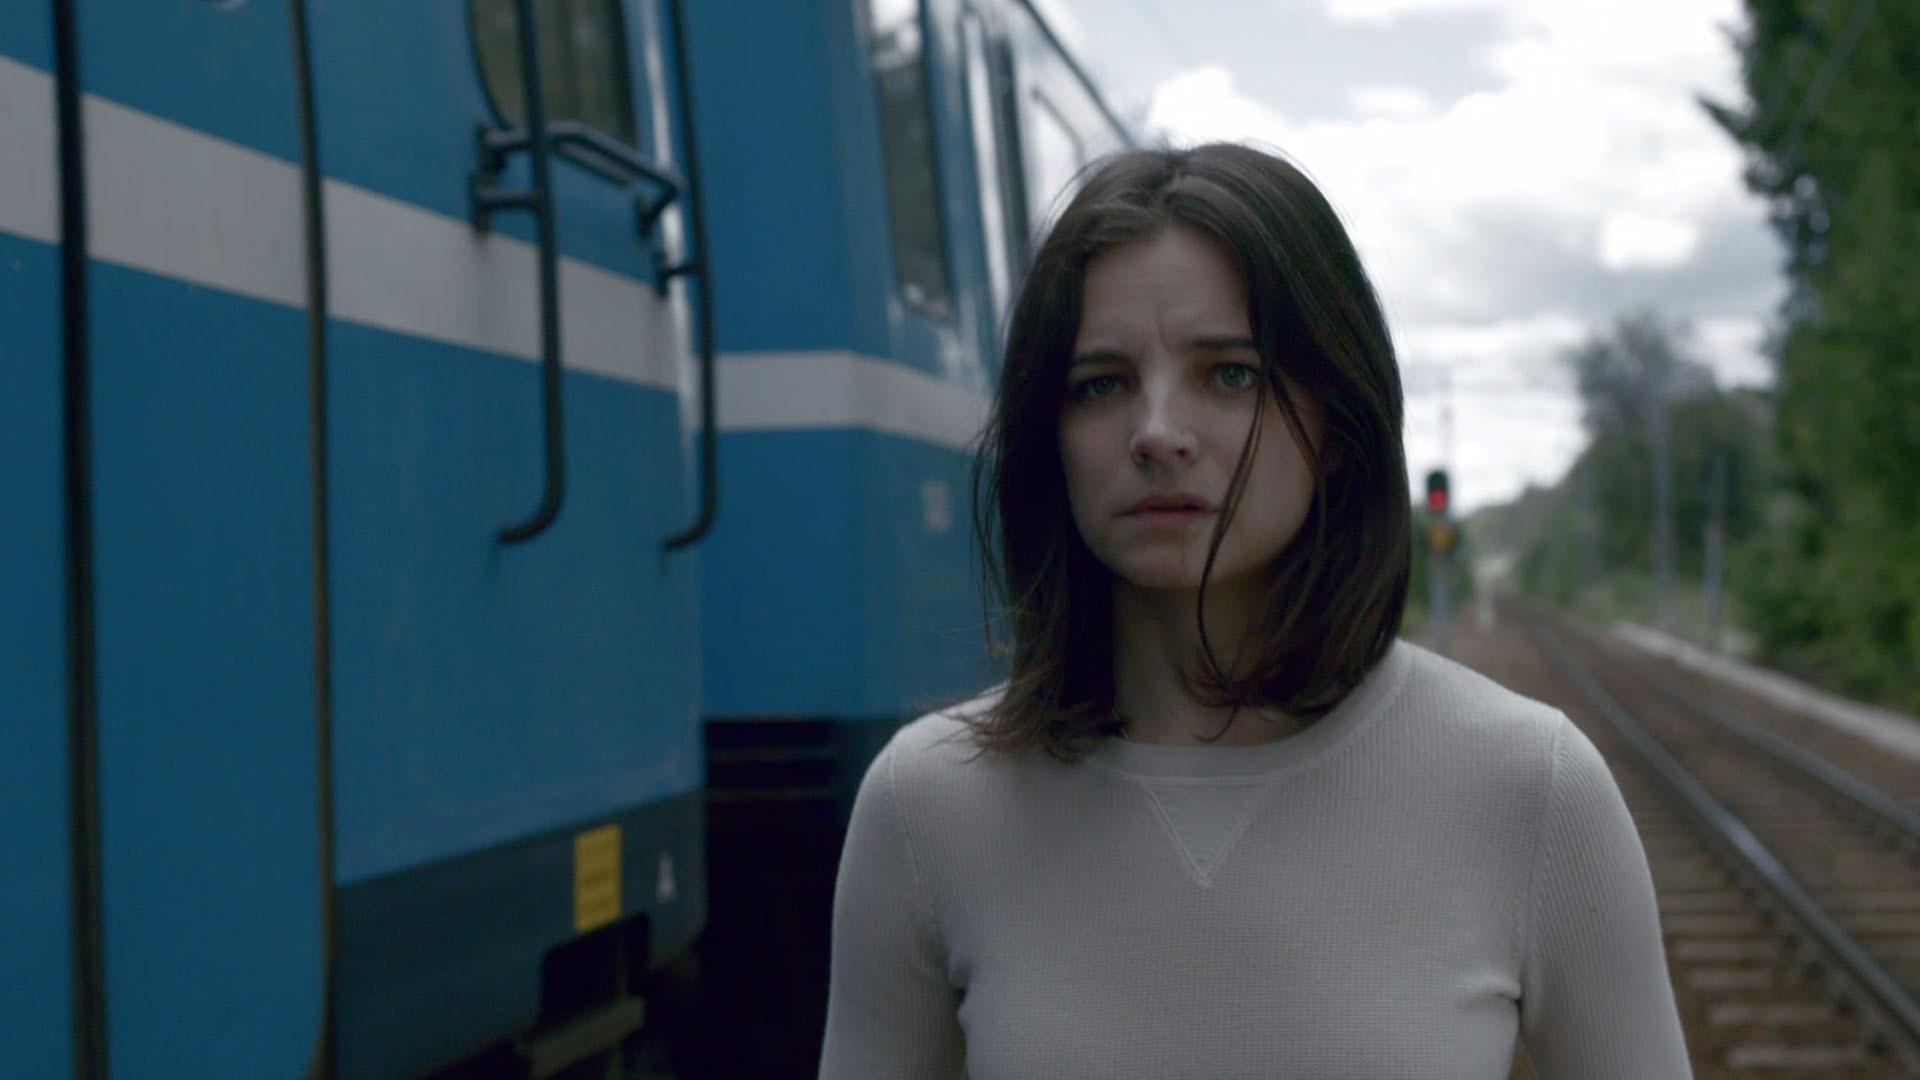 S1 Ep2: Trailer